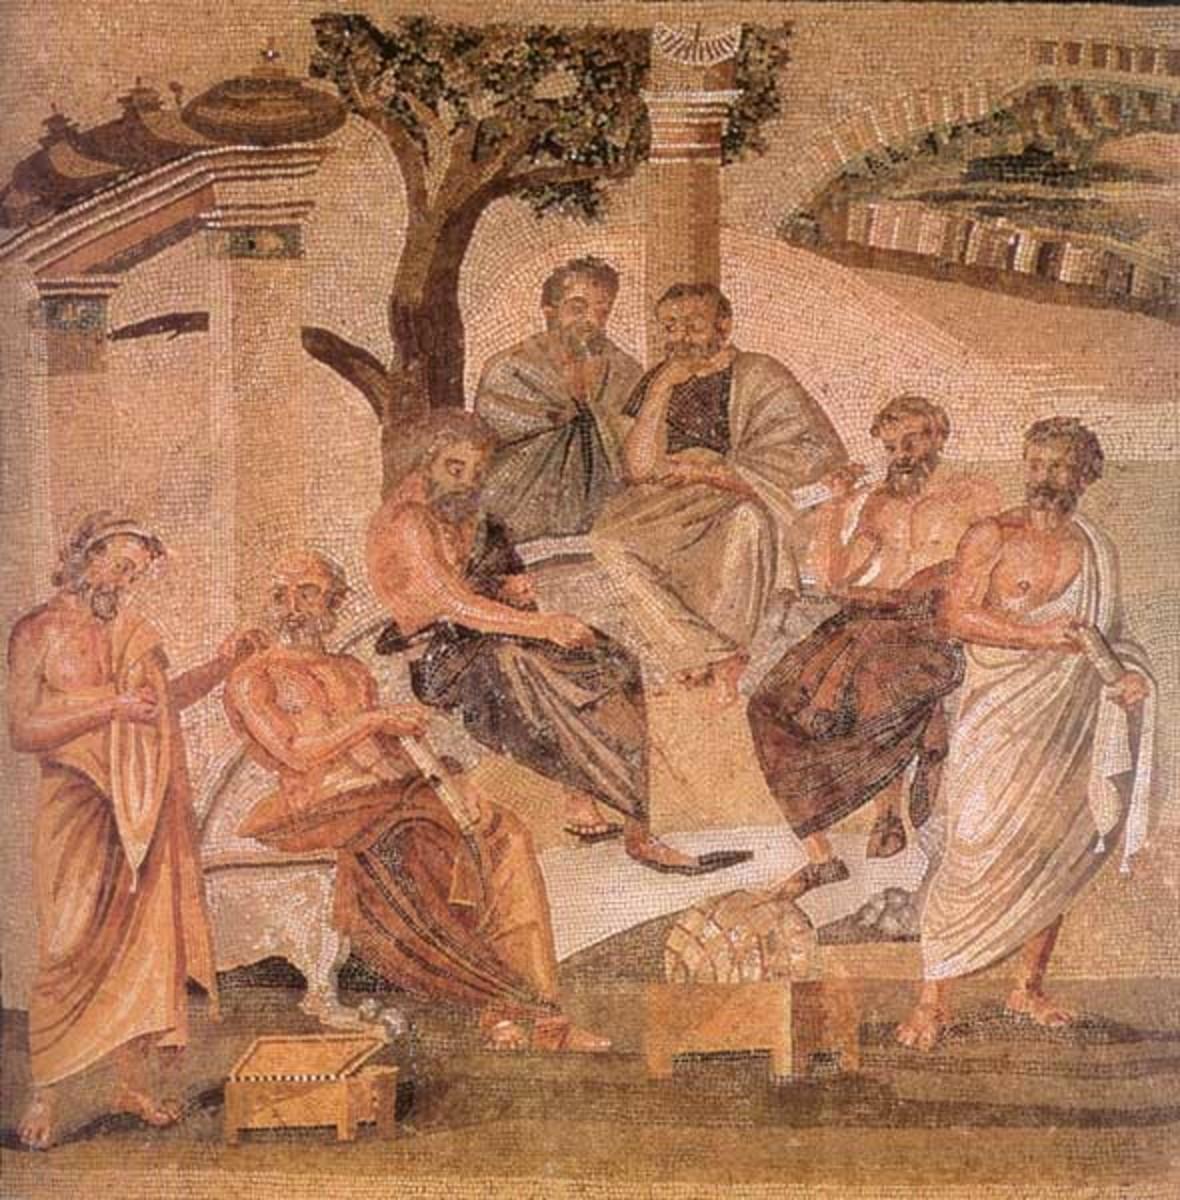 A Roman mosaic showing Plato's Academy